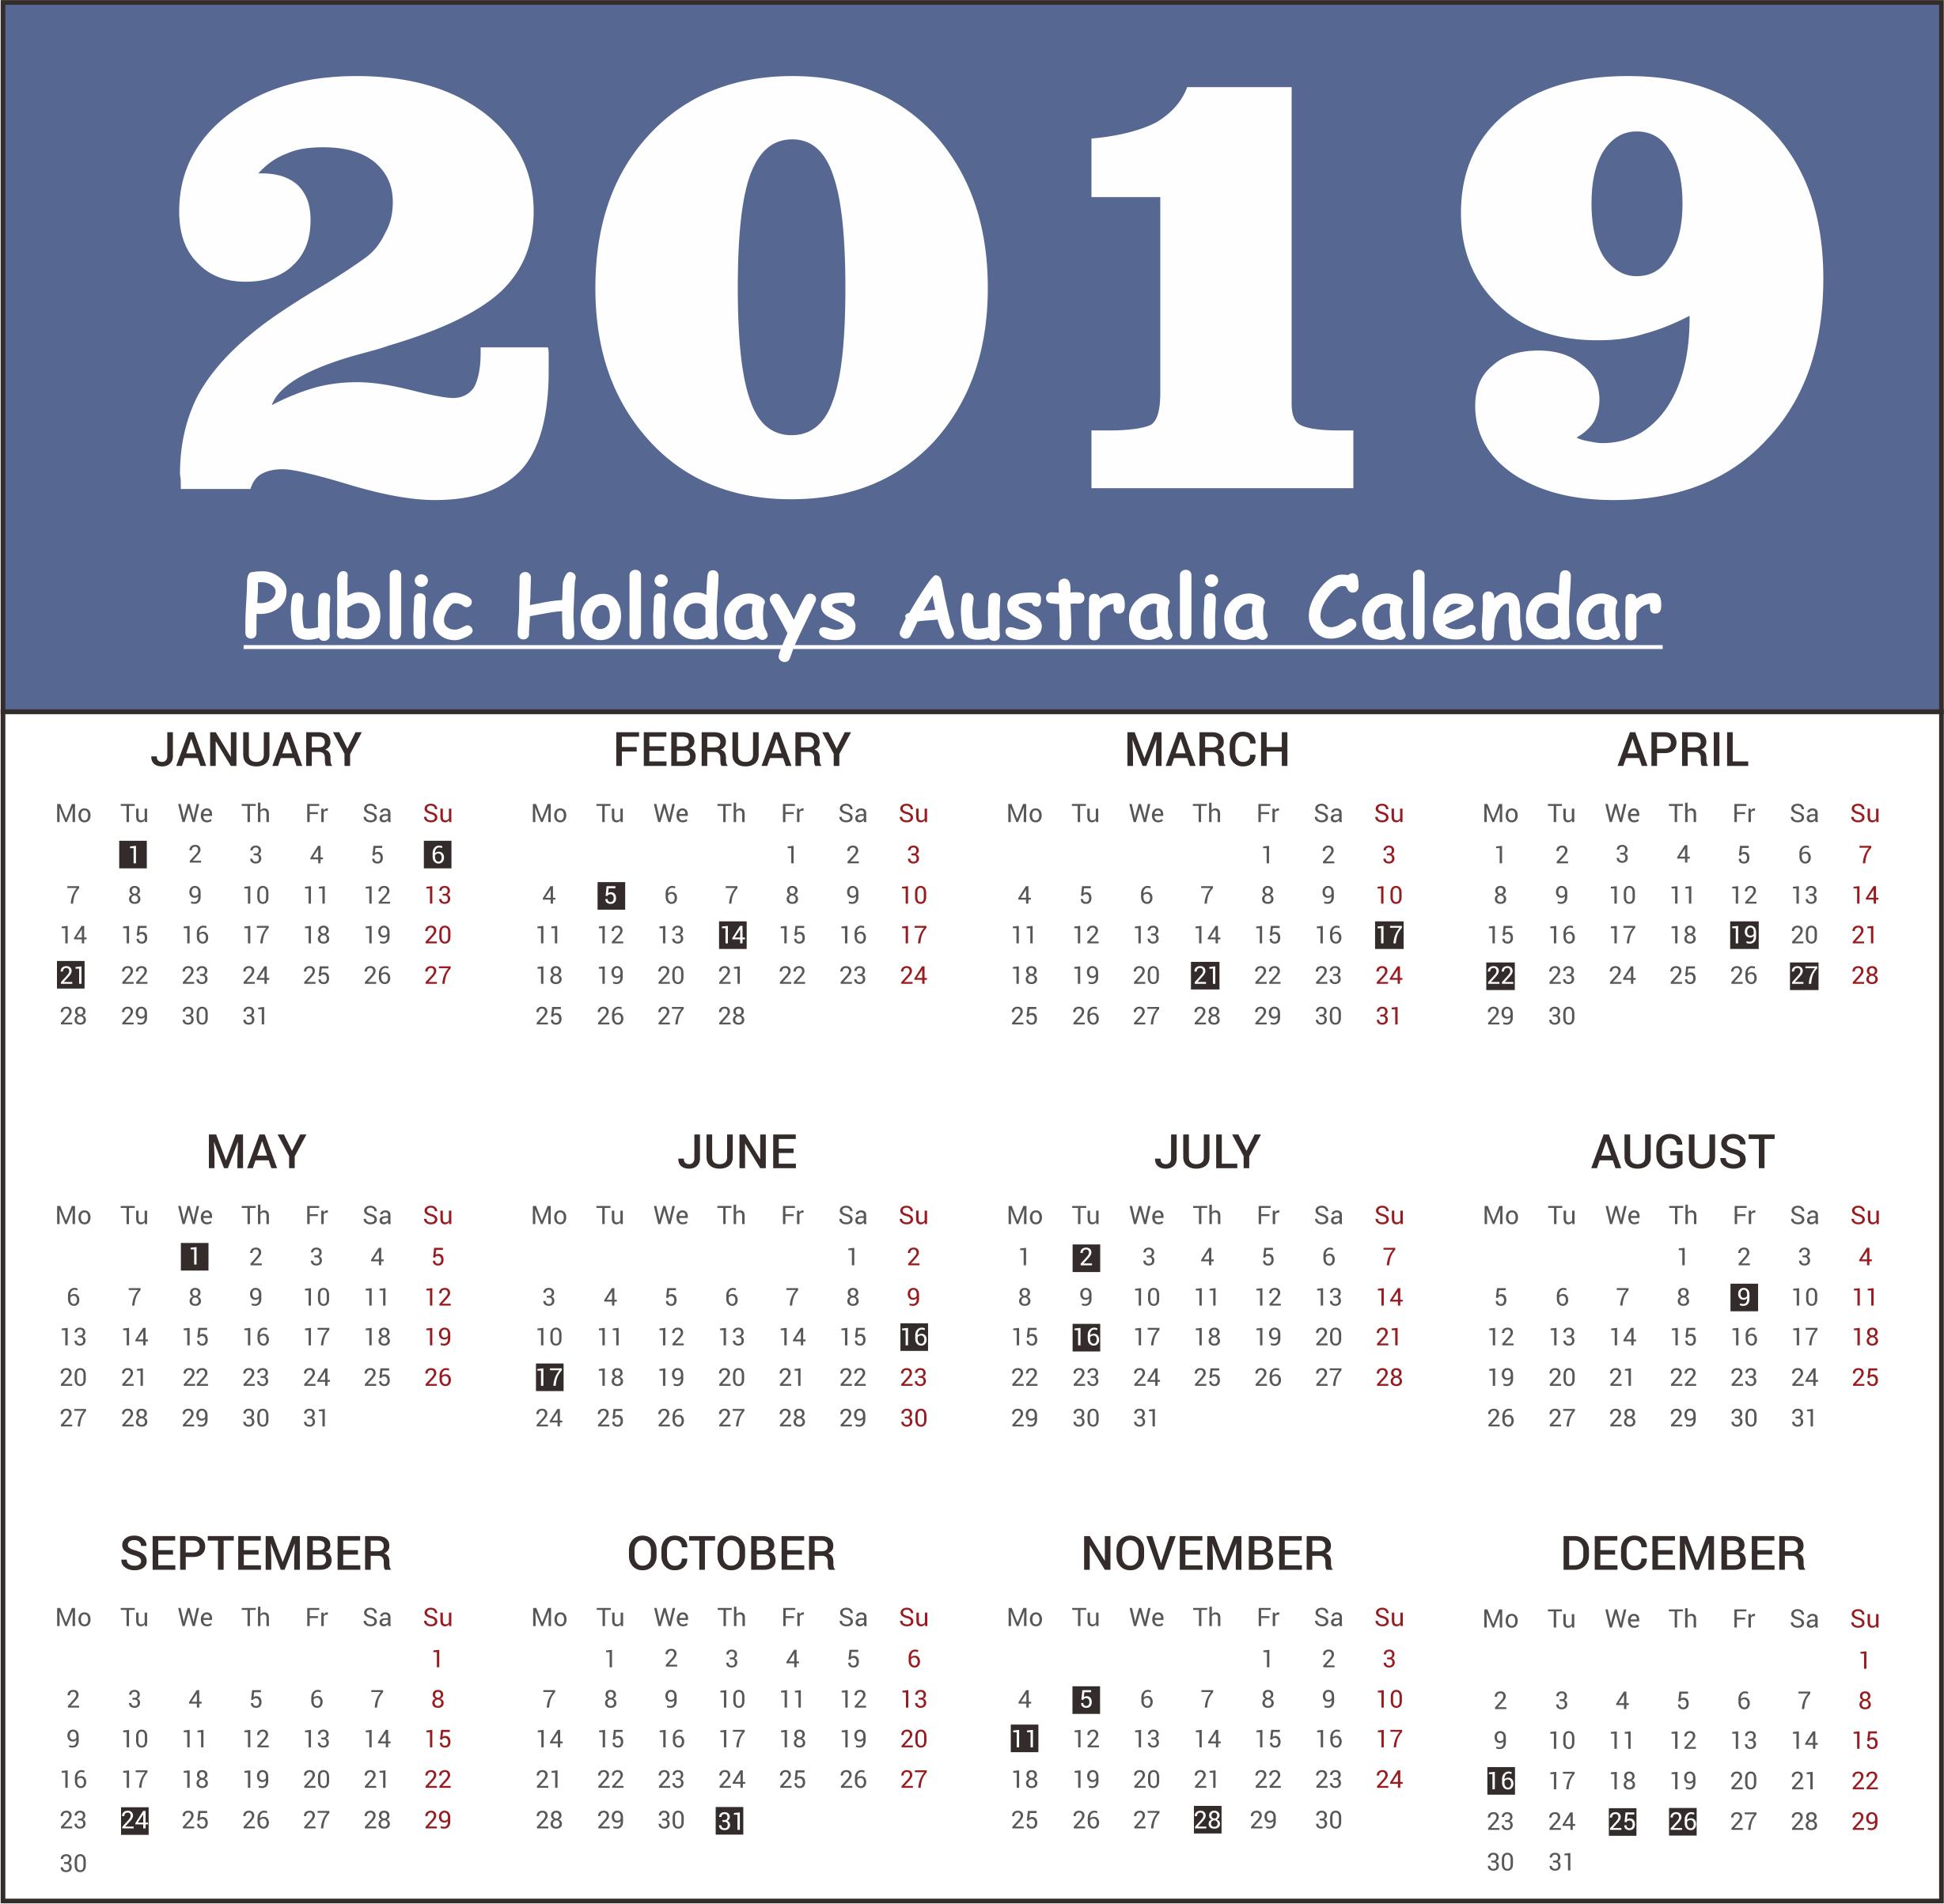 Public Holiday 2019 Australia